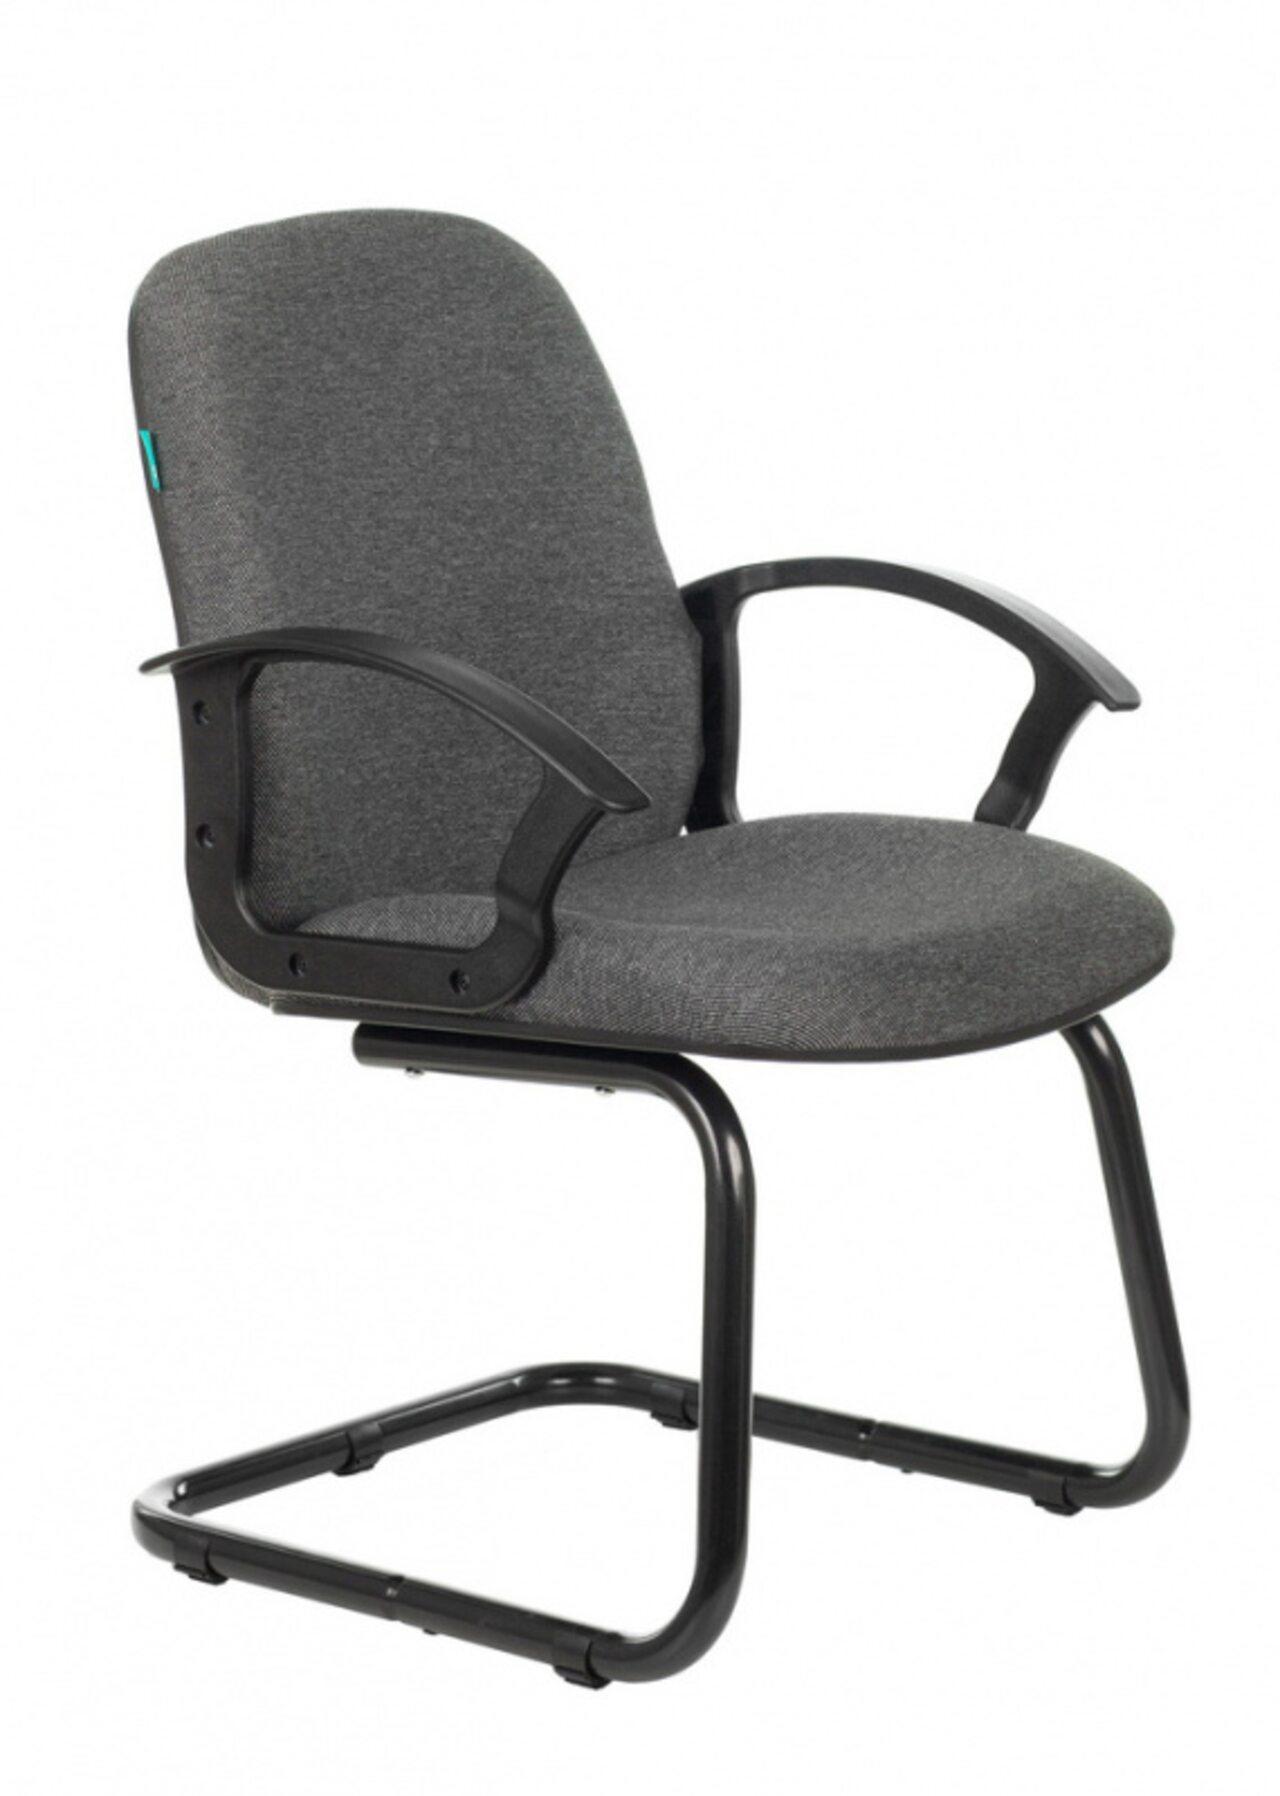 Кресло для персонала CH-808-LOW - фото 8